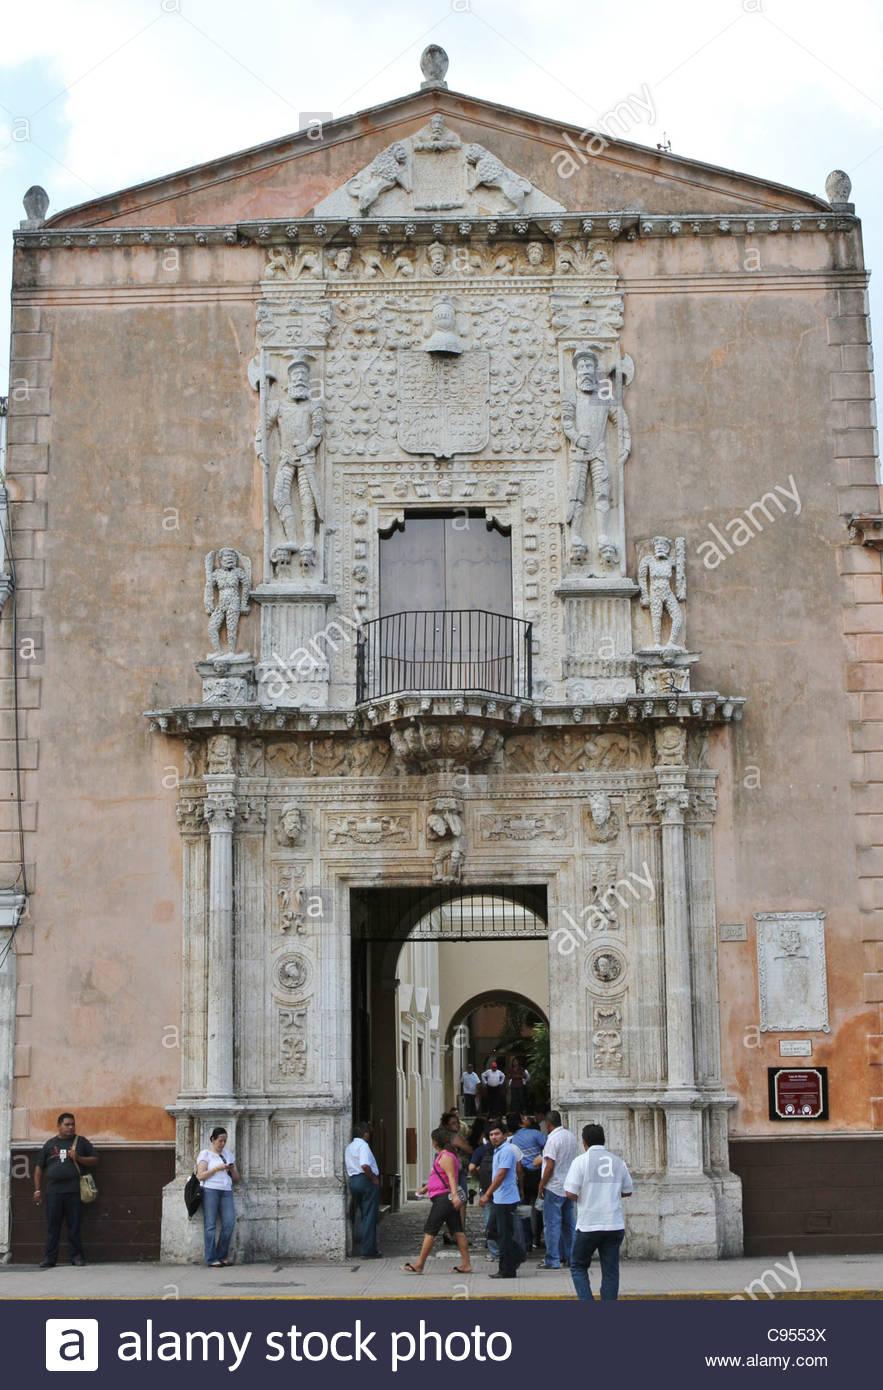 People walking in front of the Casa de Montejo in Merida, Mexico. Stock Photo